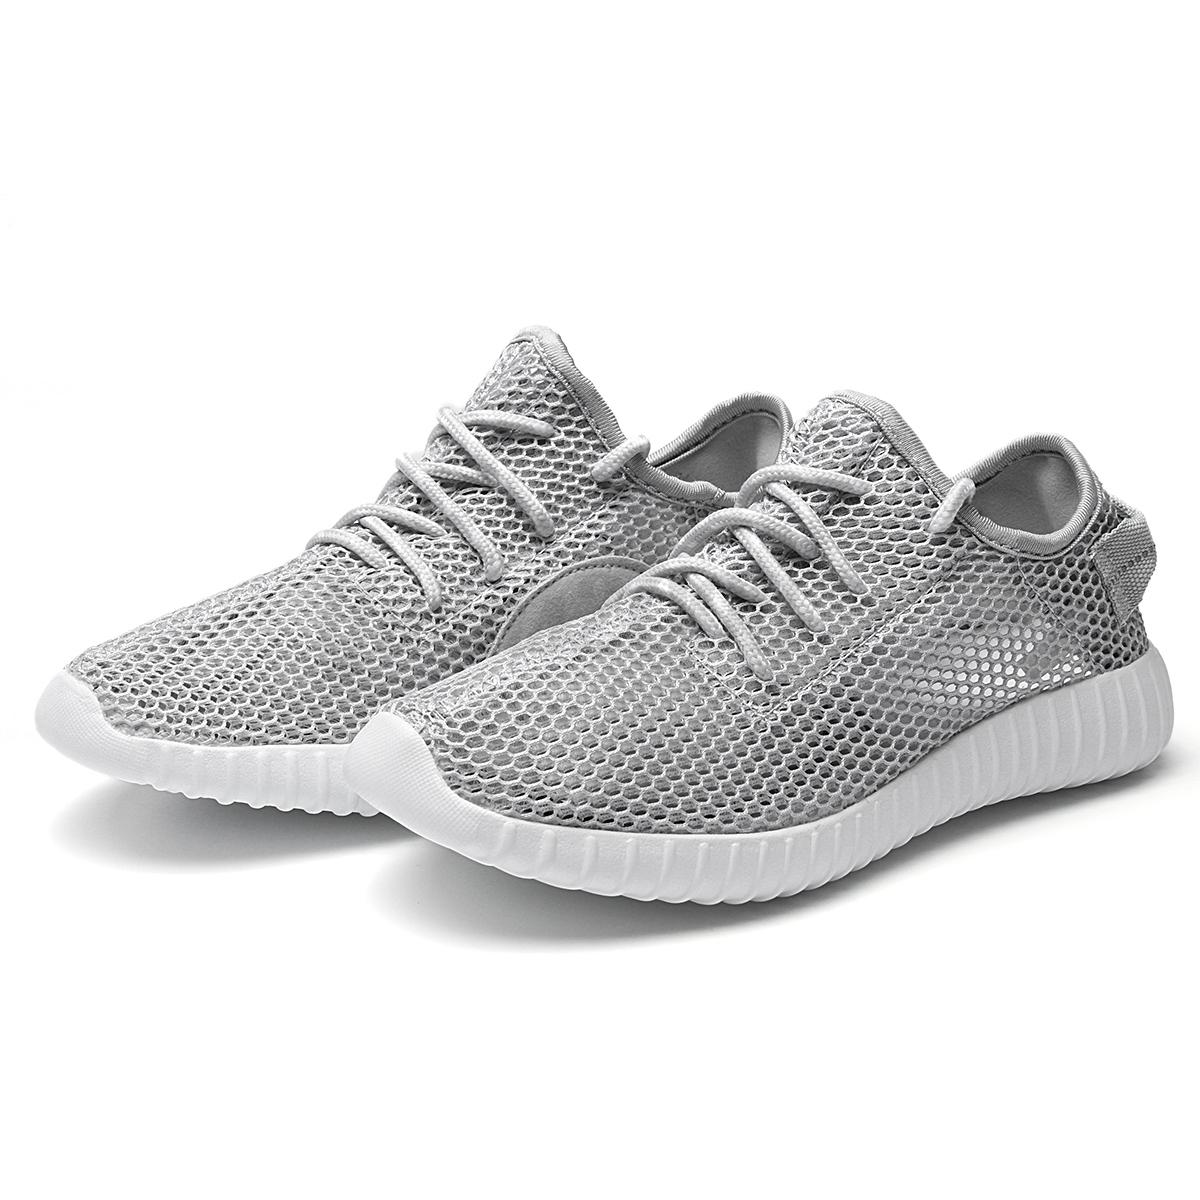 Femmes-Fille-Sneakers-Course-Sport-Jogging-GYM-Chaussures-A-Lacets-Baskets-Shoes miniature 20